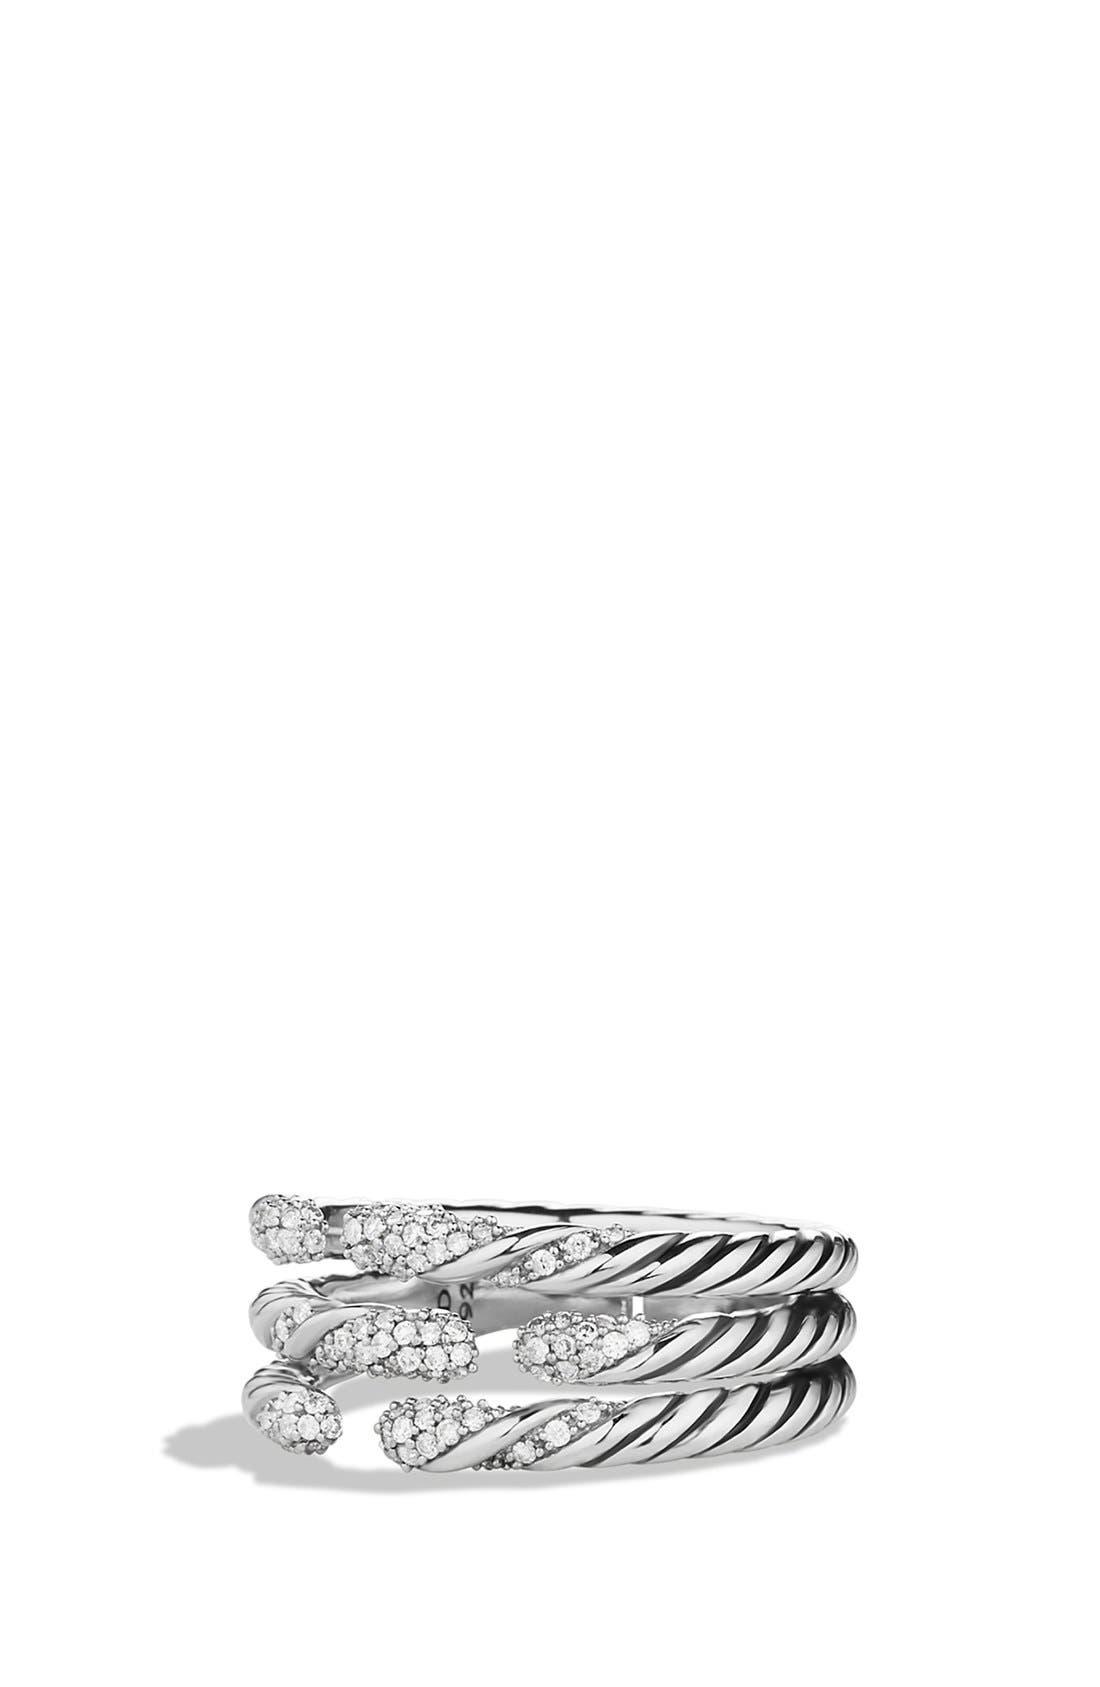 David Yurman 'Willow' Three-Row Ring with Diamonds